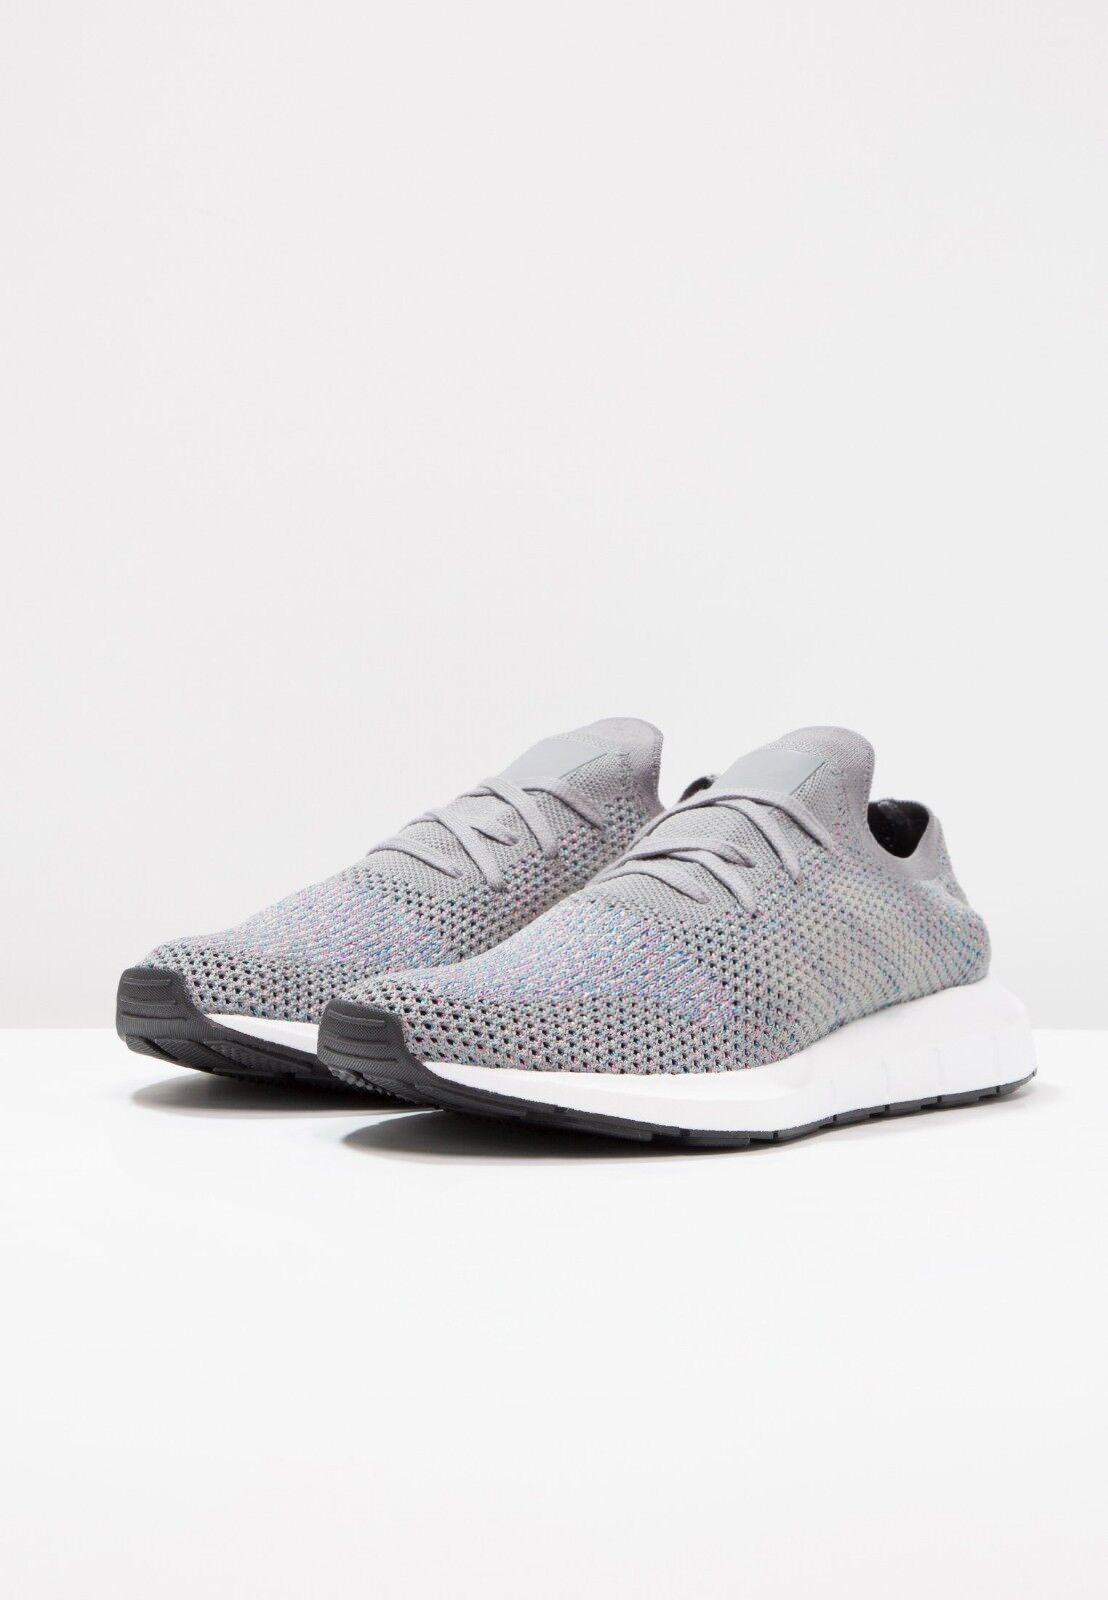 adidas Originals SWIFT RUN PK Sneaker Low Herren Sneaker Grau Gr 40 S4553